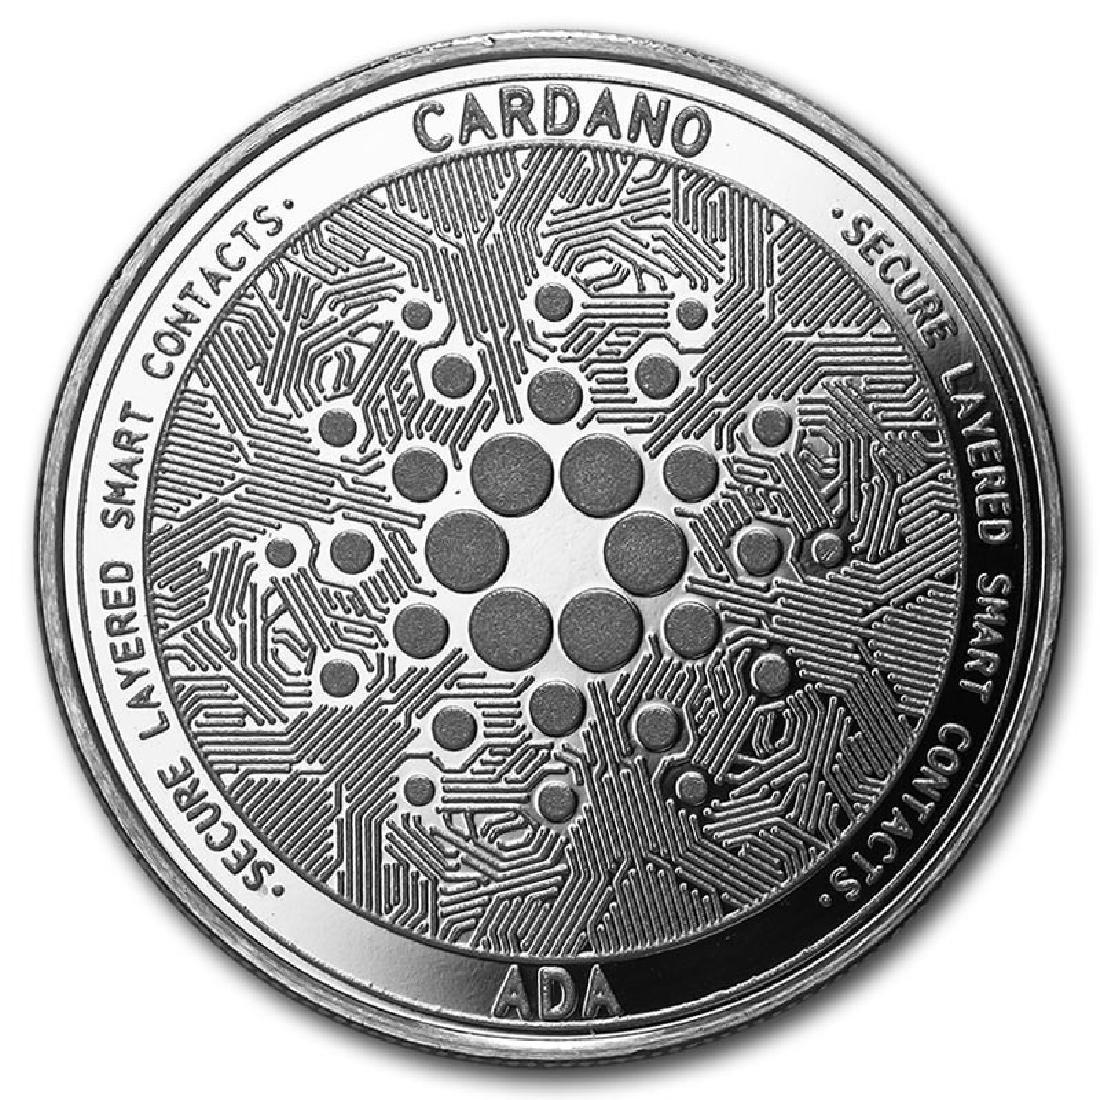 1 oz Silver Bullion Cryptocurrency Cardano Round .999 f